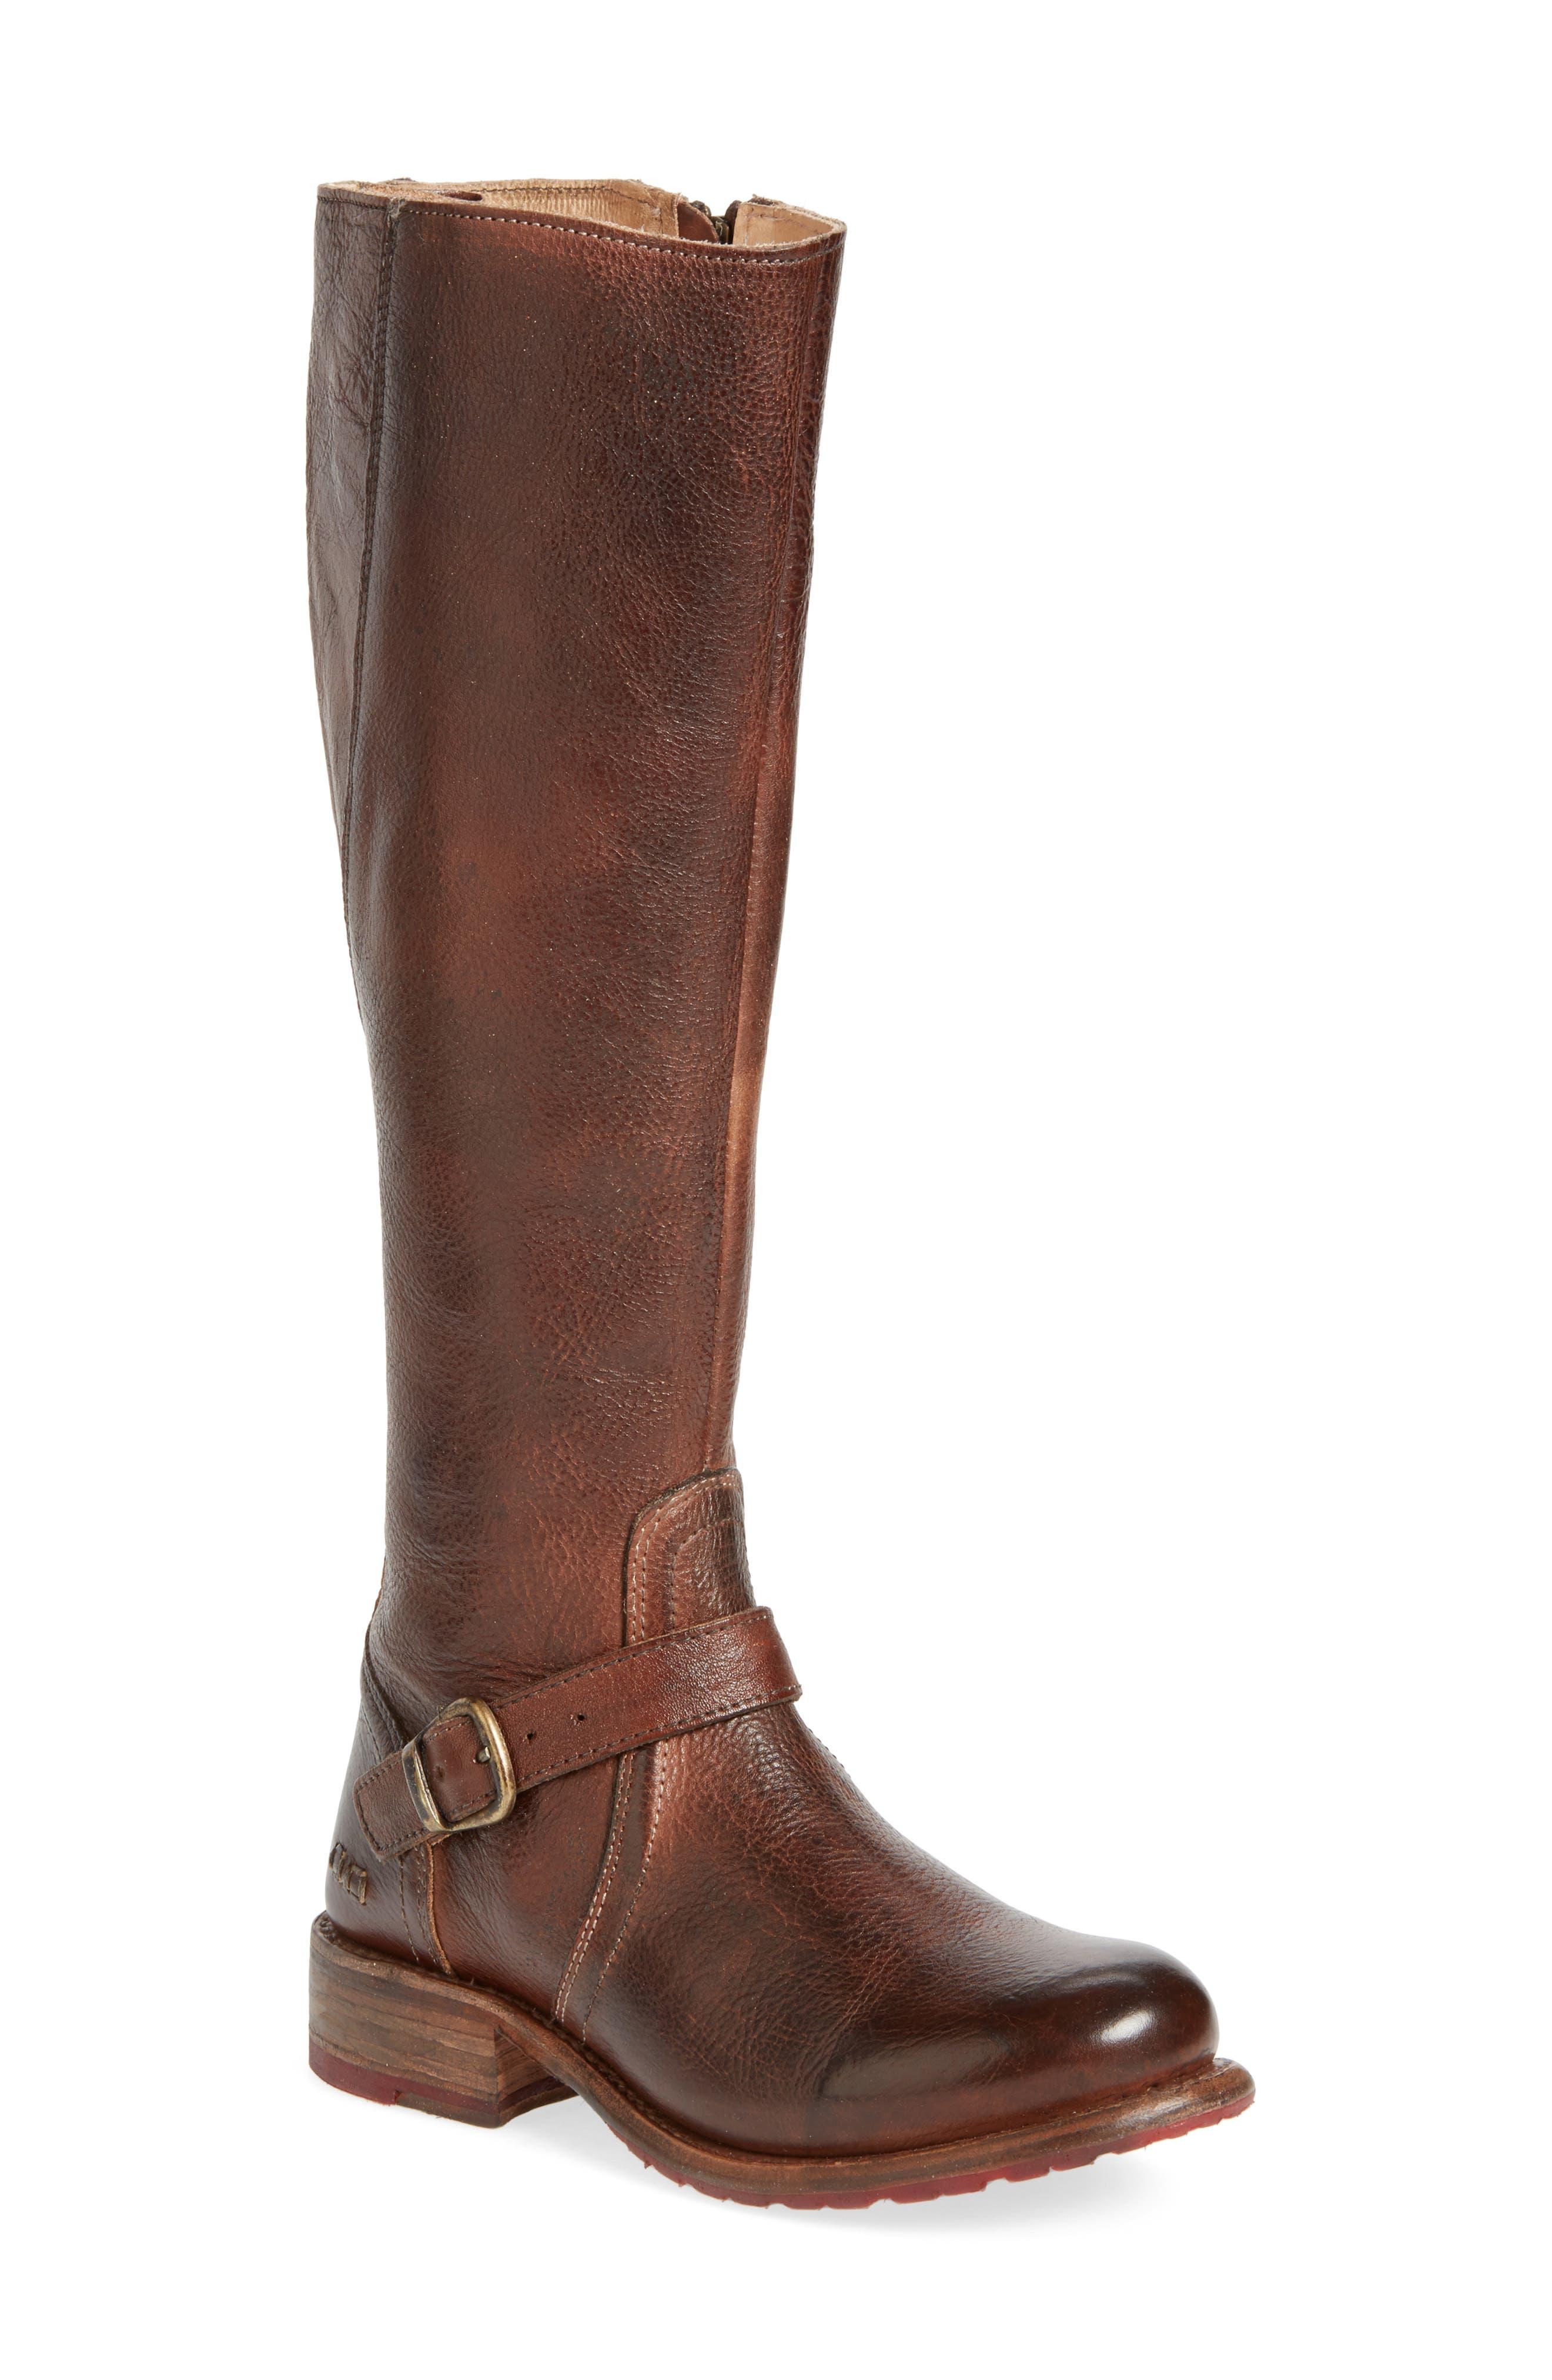 Alternate Image 1 Selected - Bed Stu 'Glaye' Tall Boot (Women)